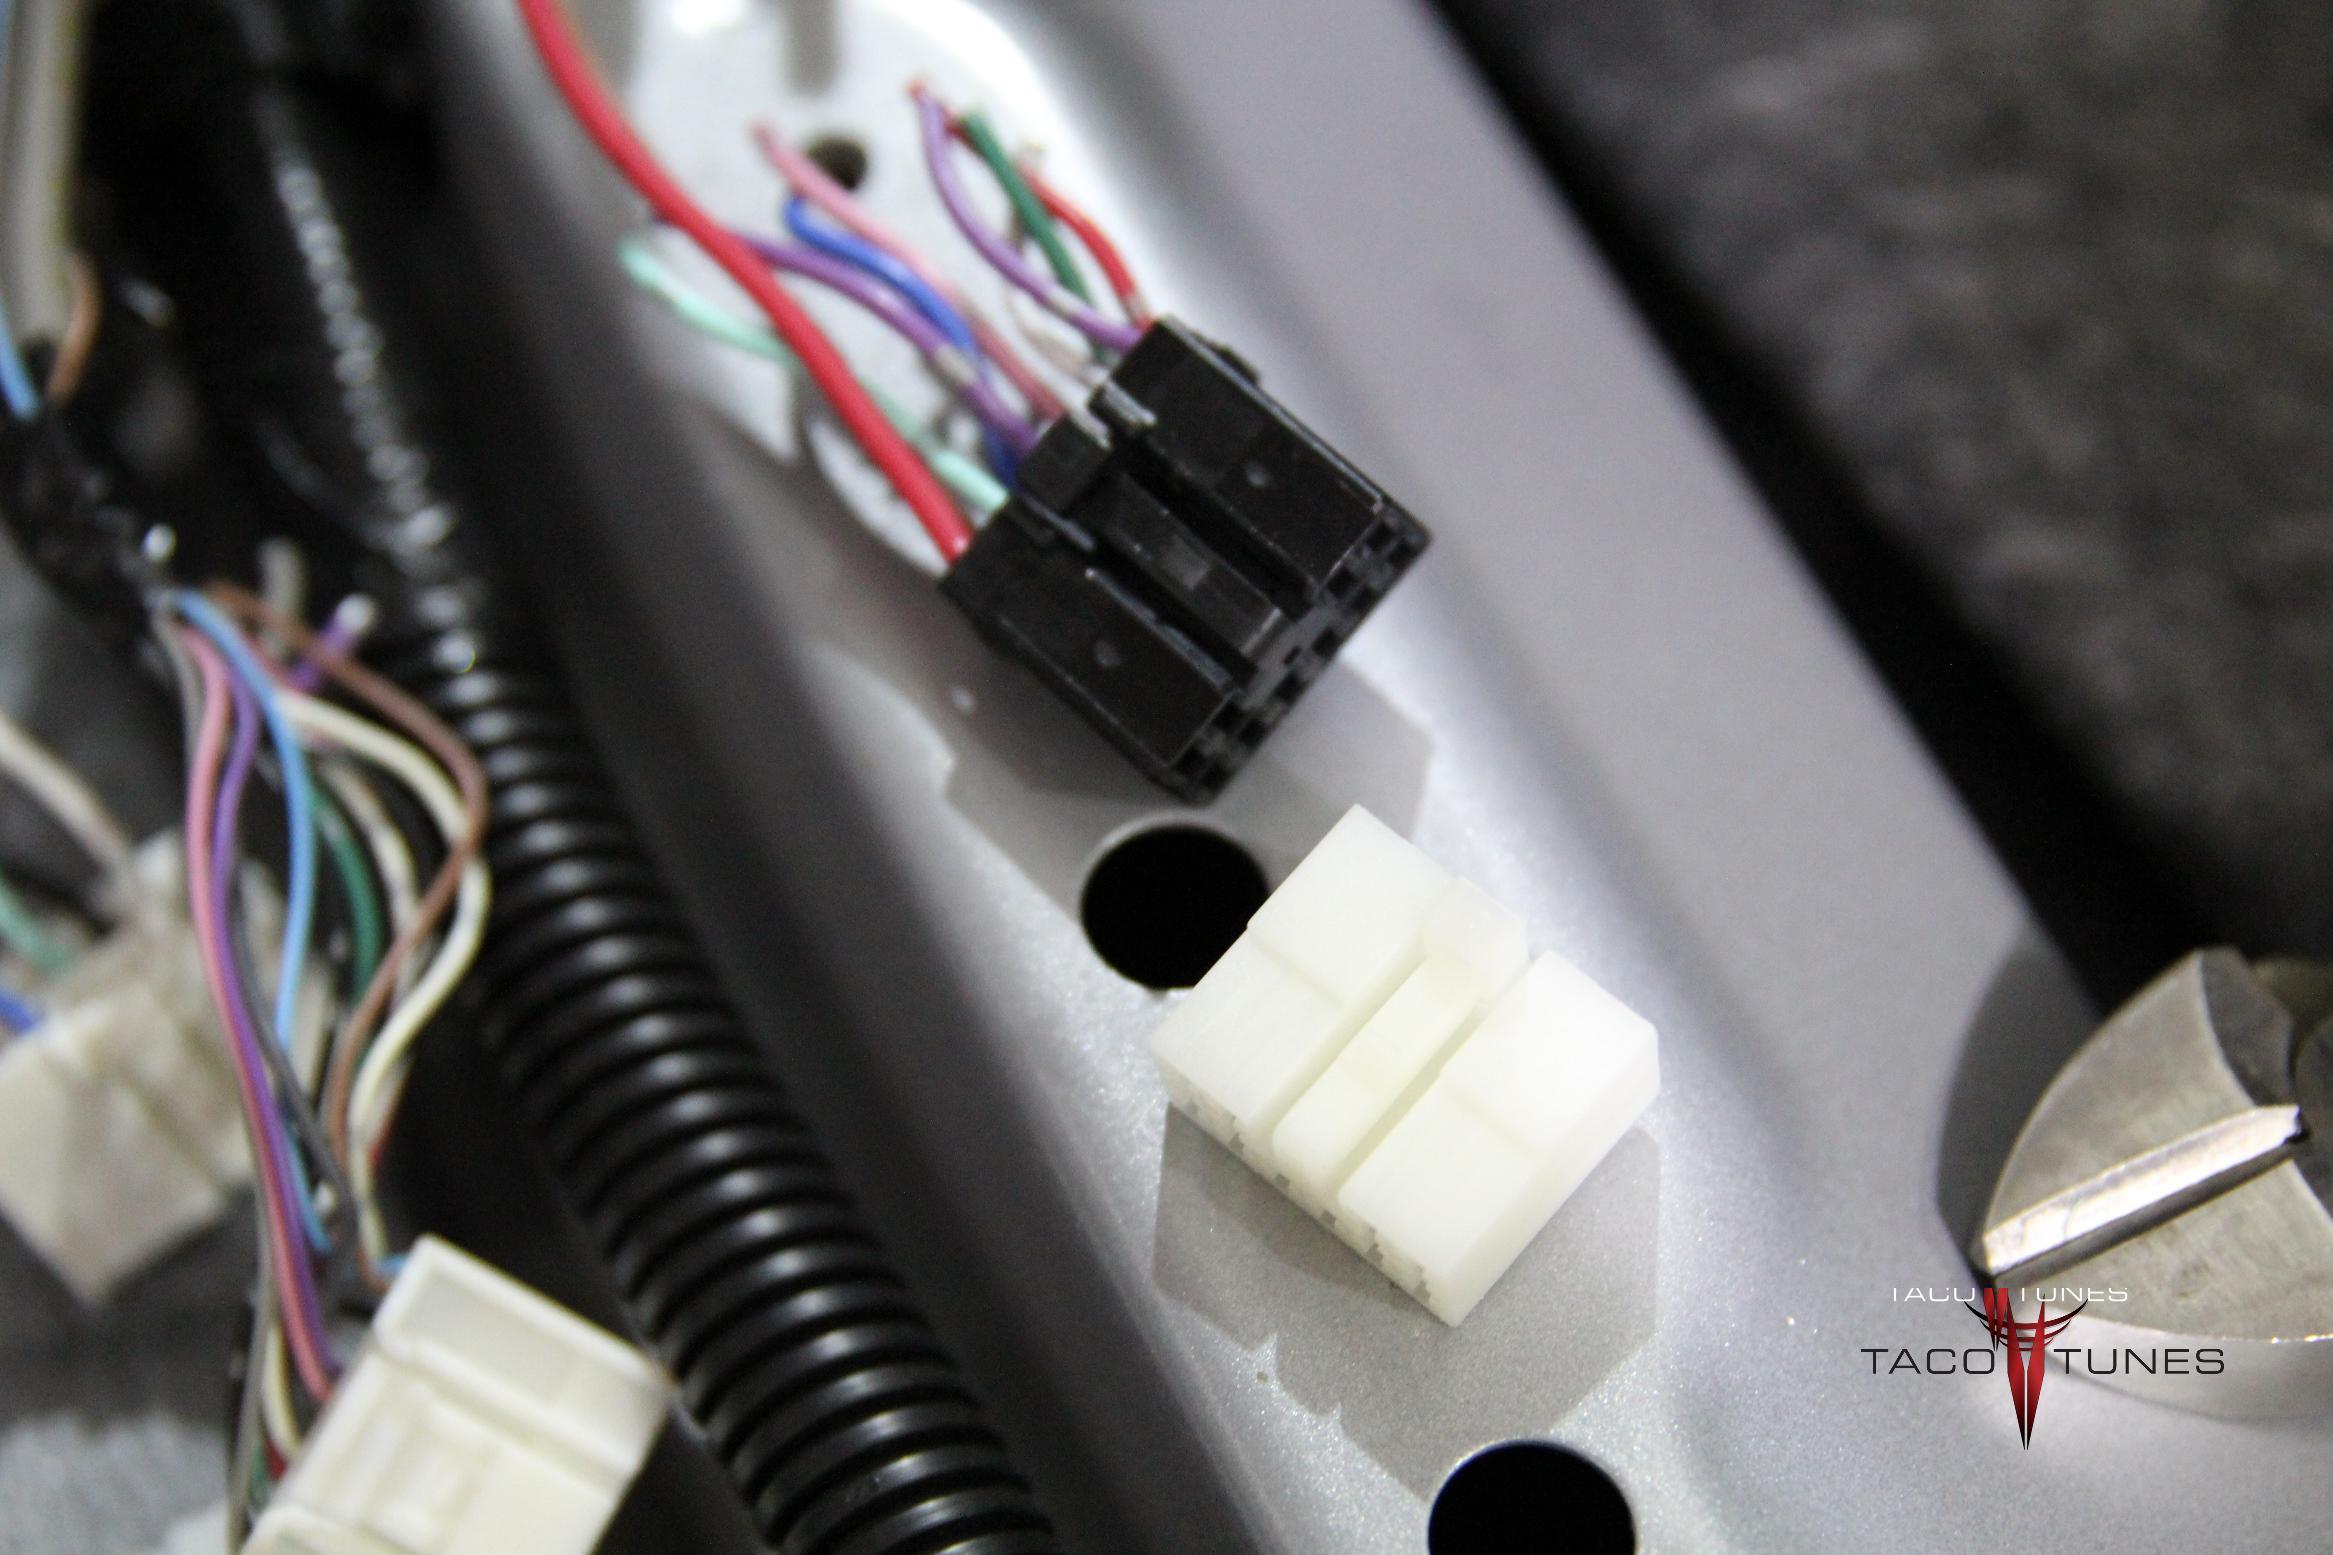 JBL Wiring Harness Repair Making New Harness 5?resize=647%2C431 toyota wire harness repair toyota wiring connectors, toyota wire toyota wire harness repair kit at eliteediting.co